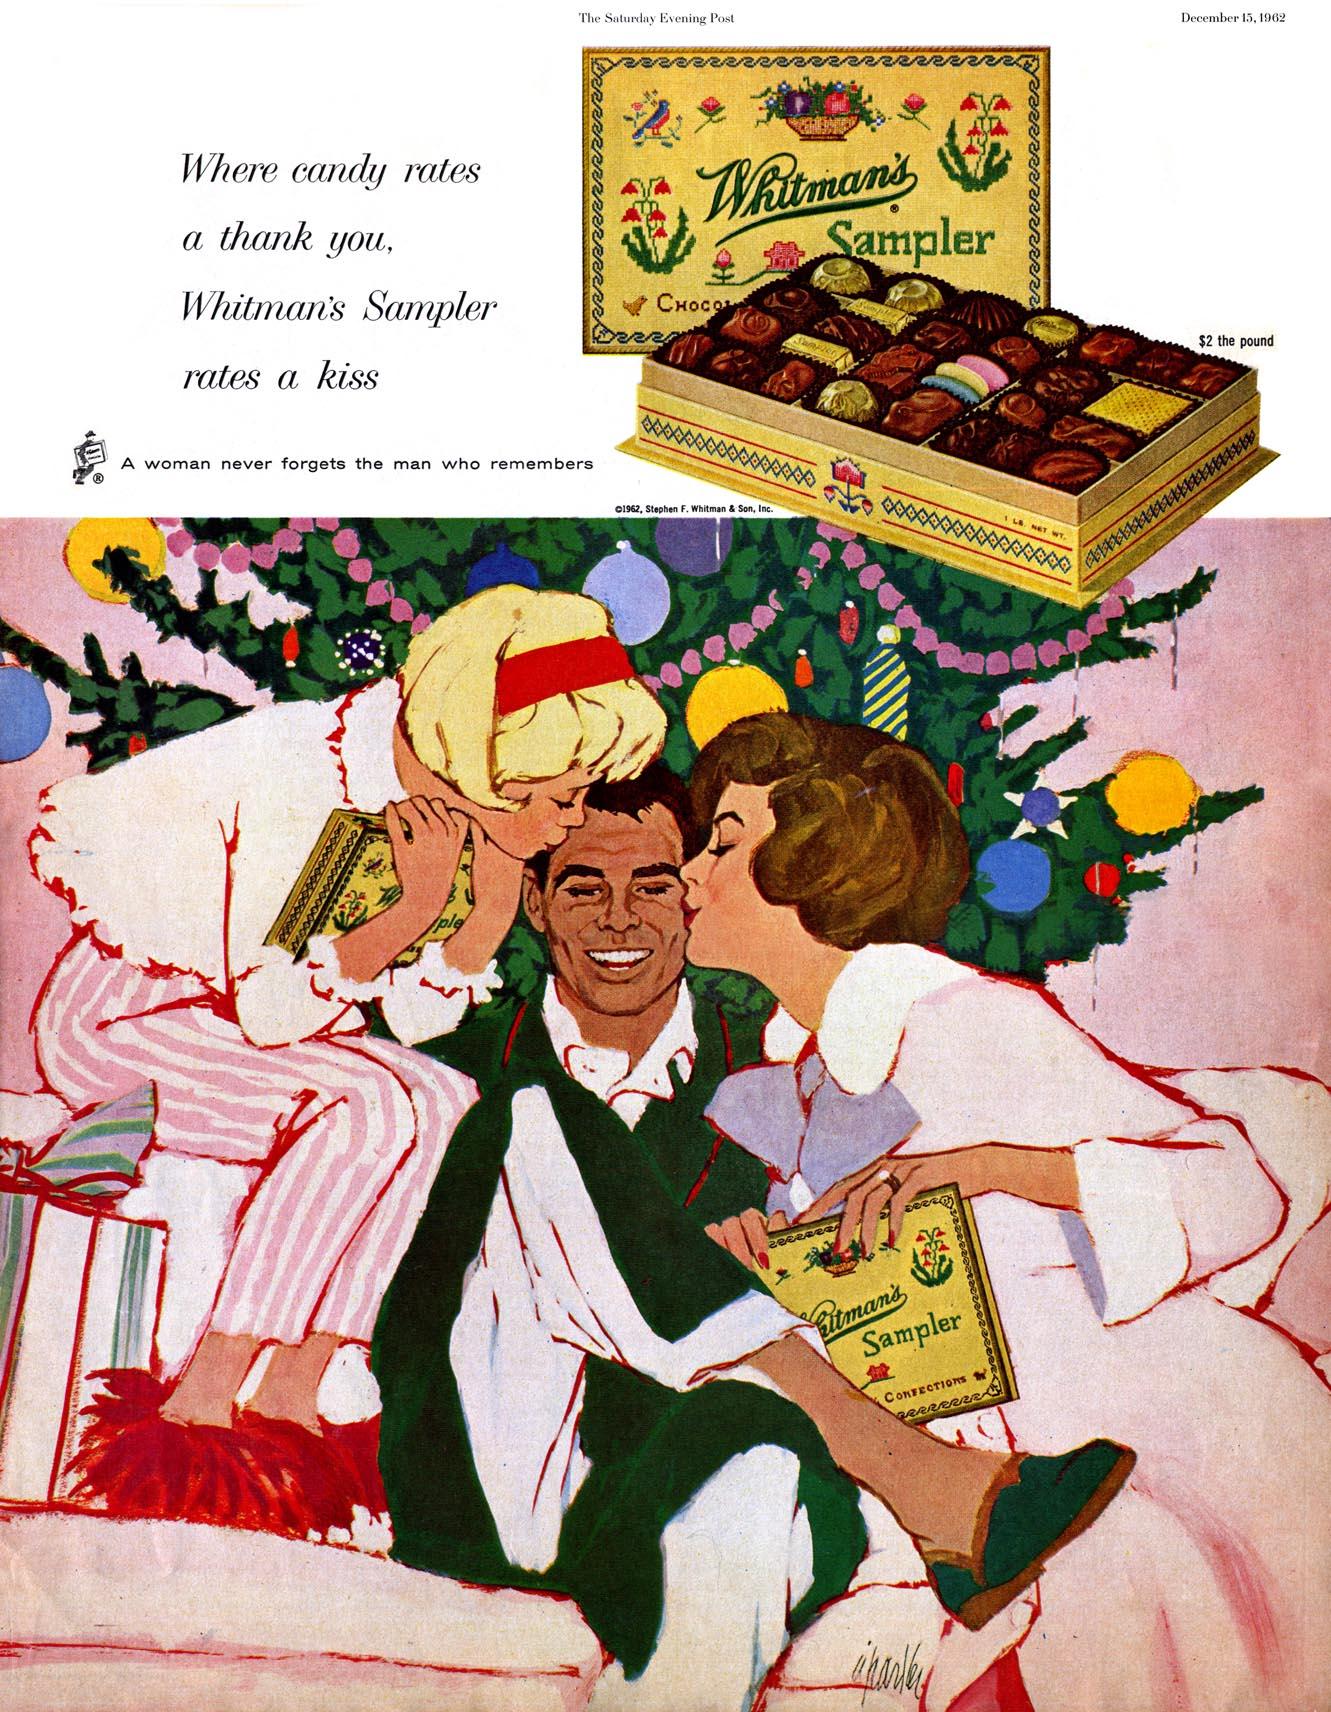 Whitman's Sampler - published in The Saturday Evening Post - December 15, 1962 - Illustration by Al Parker